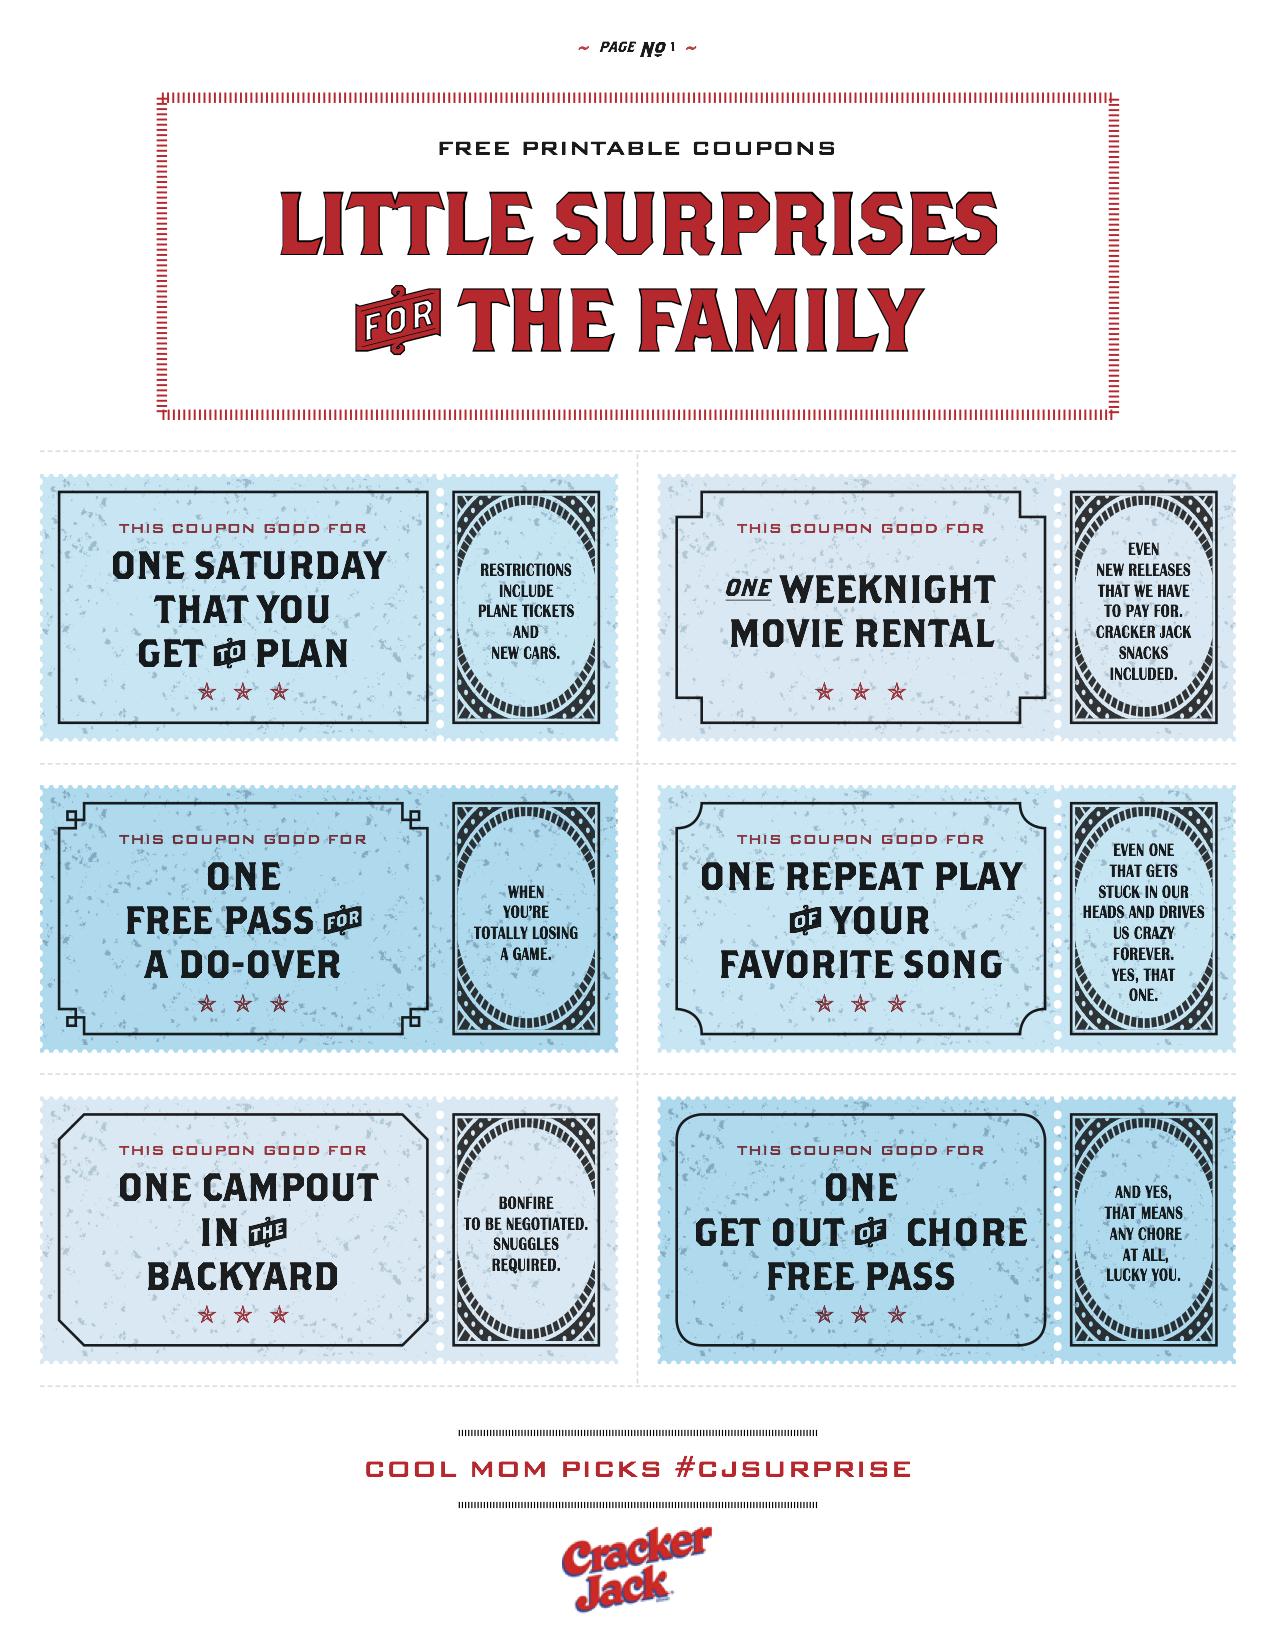 Free Printable Coupons That Make Awesome Family Gifts - Free Printable Coupons Without Downloads